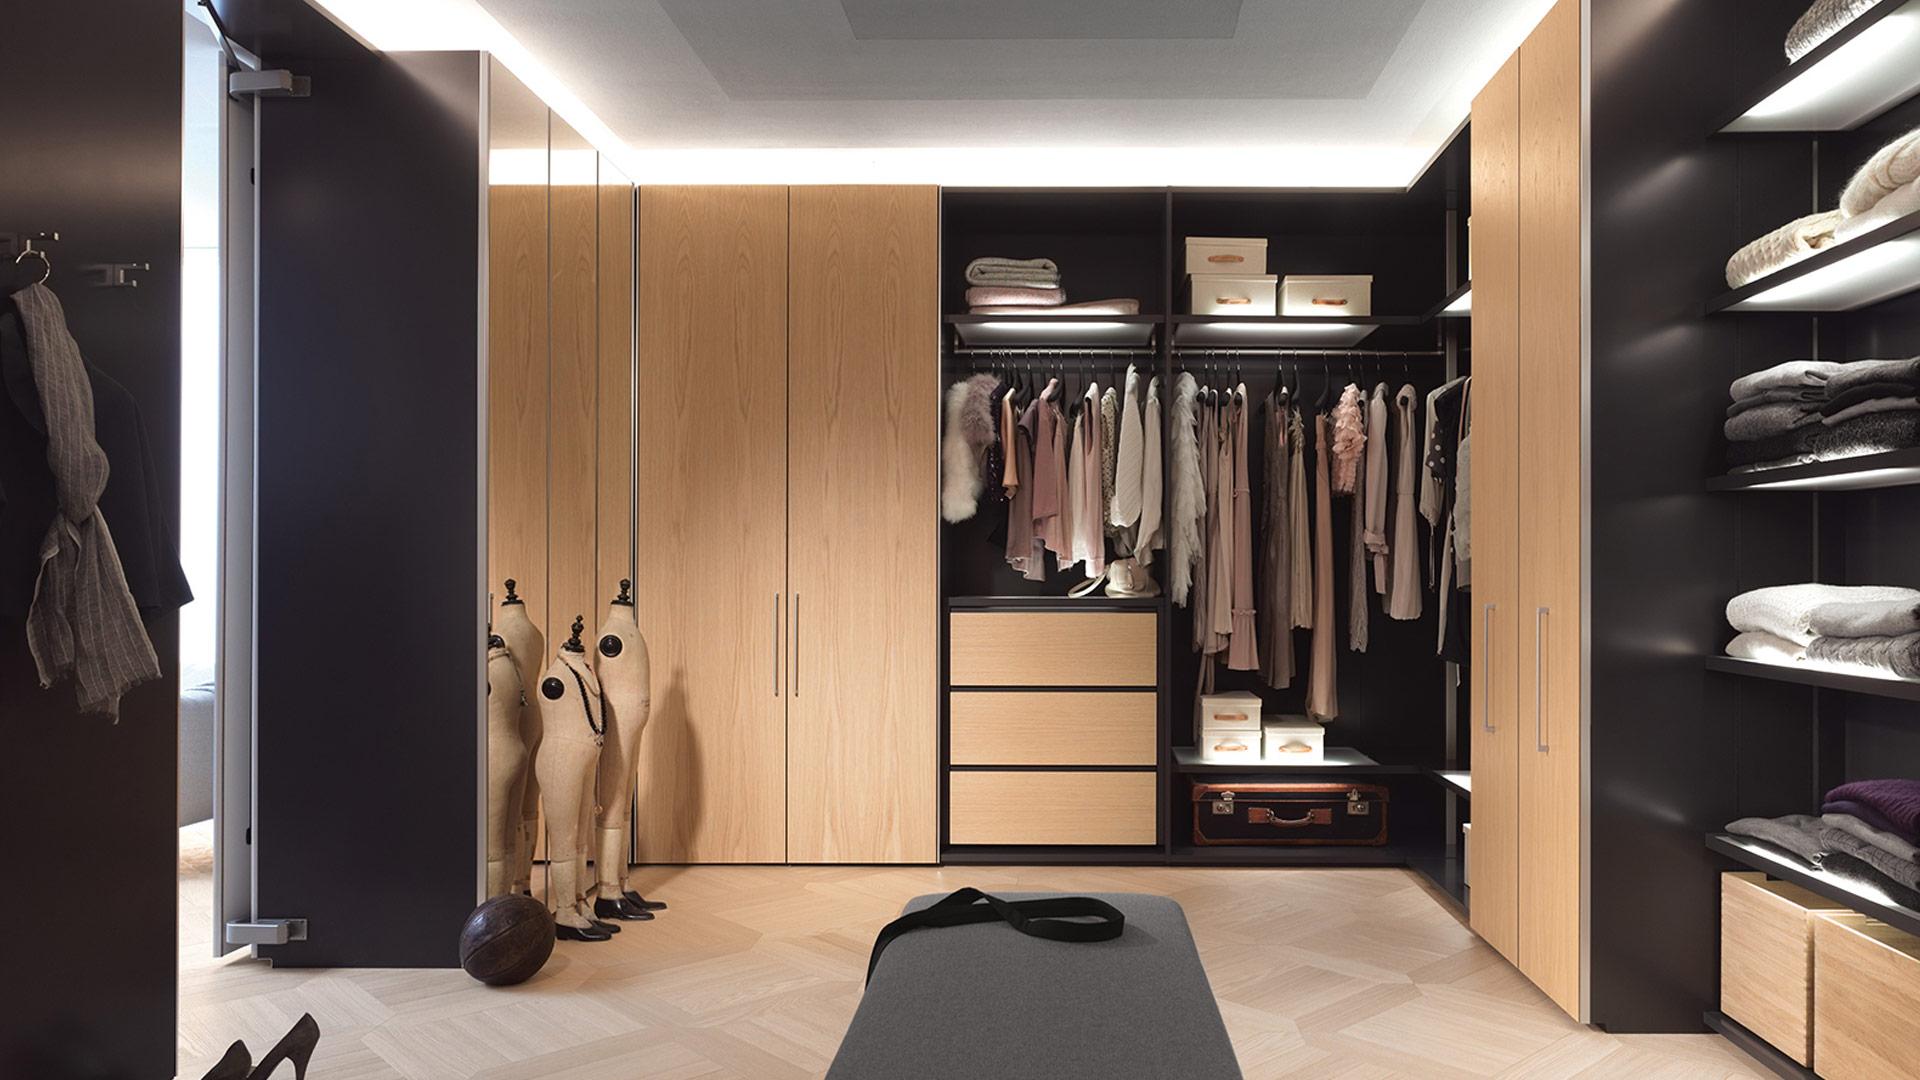 schlafraum wohn design blau. Black Bedroom Furniture Sets. Home Design Ideas